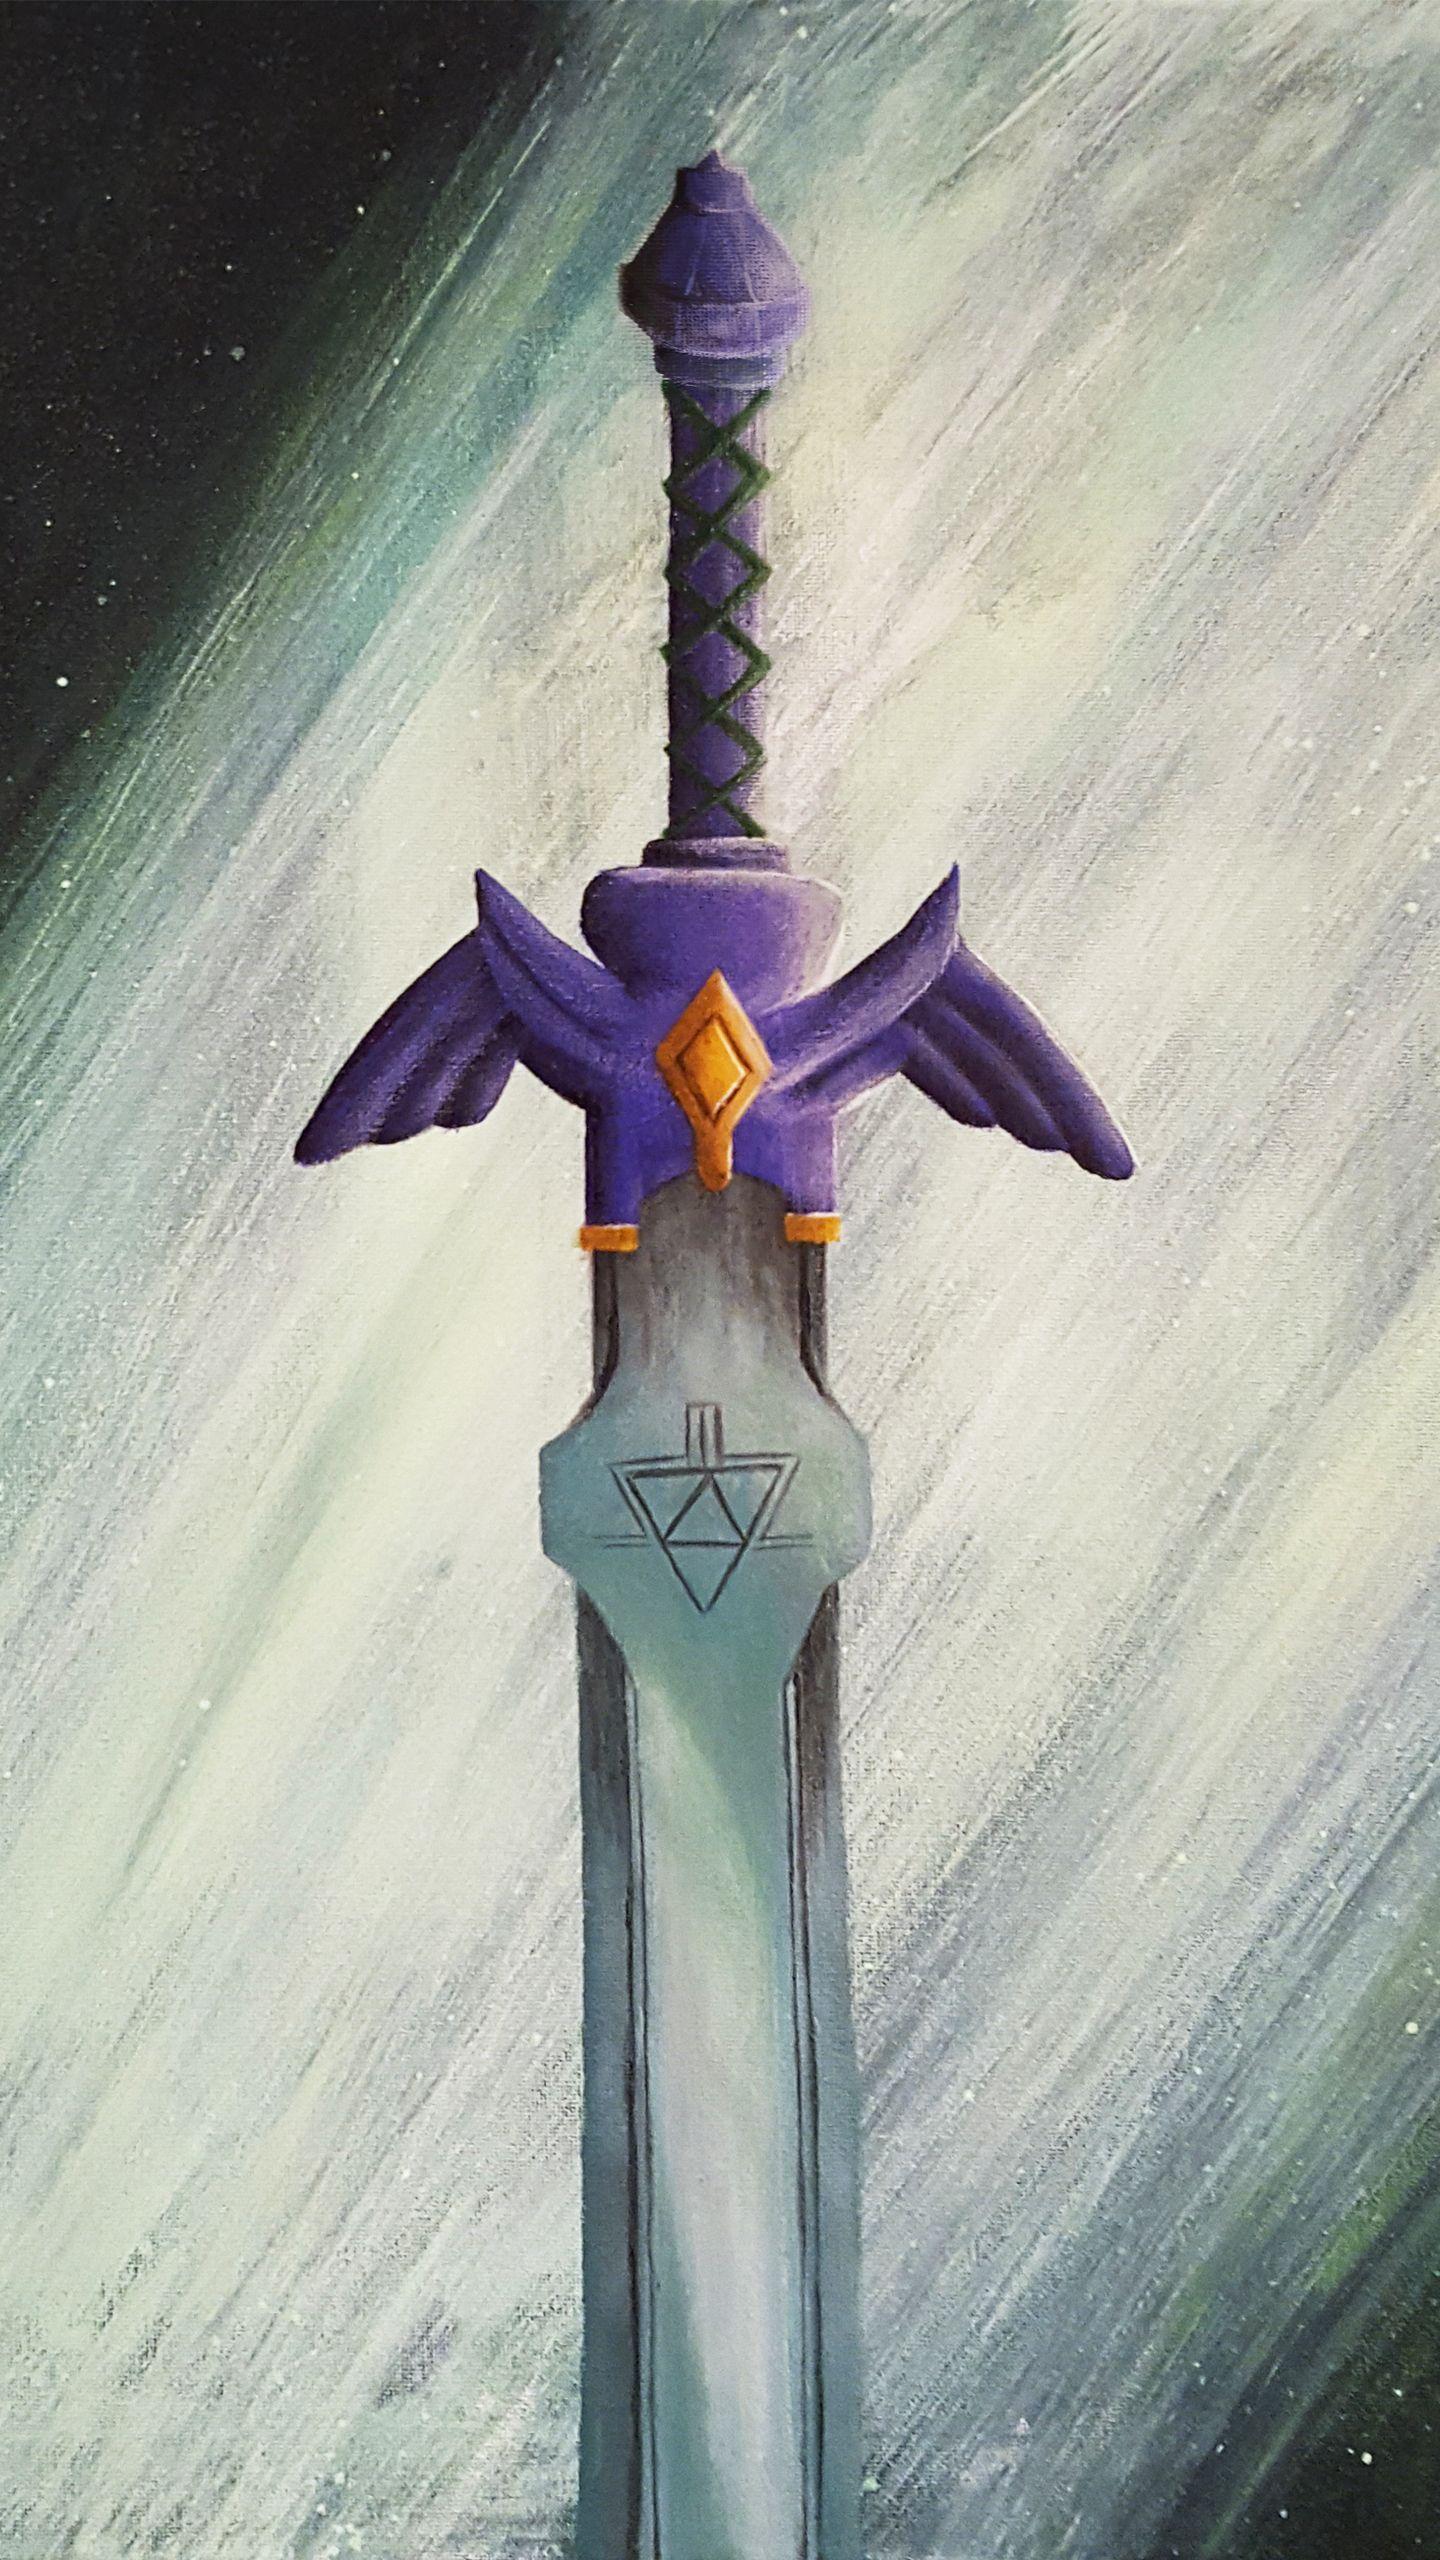 The Master Sword Awaits Mobile Wallpaper